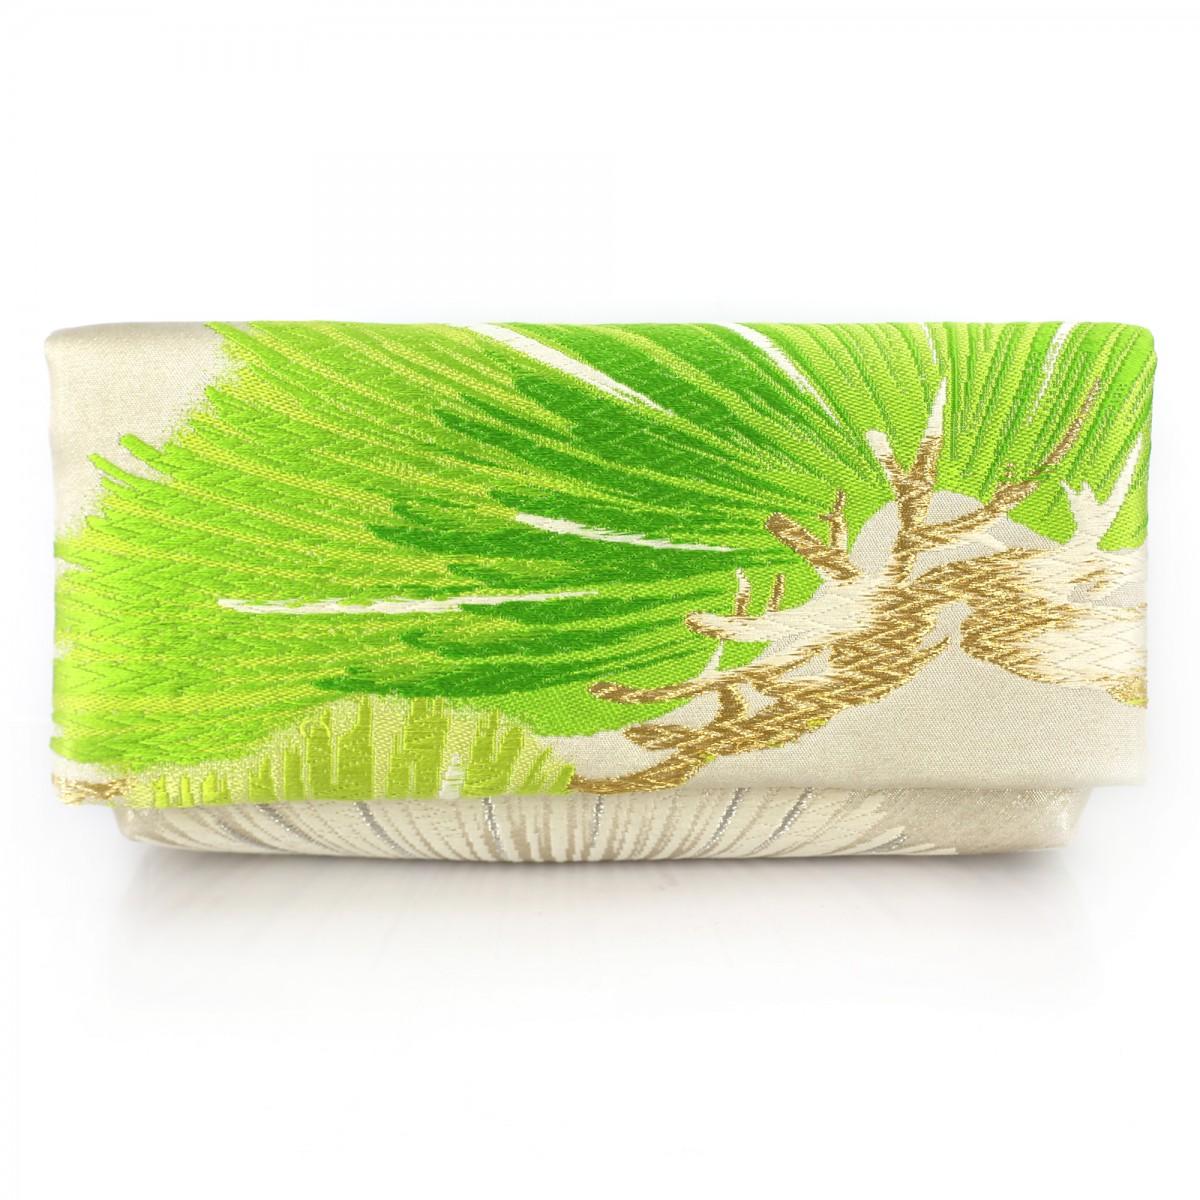 Kimono Envelope Clutch with Light Green Pine Tree